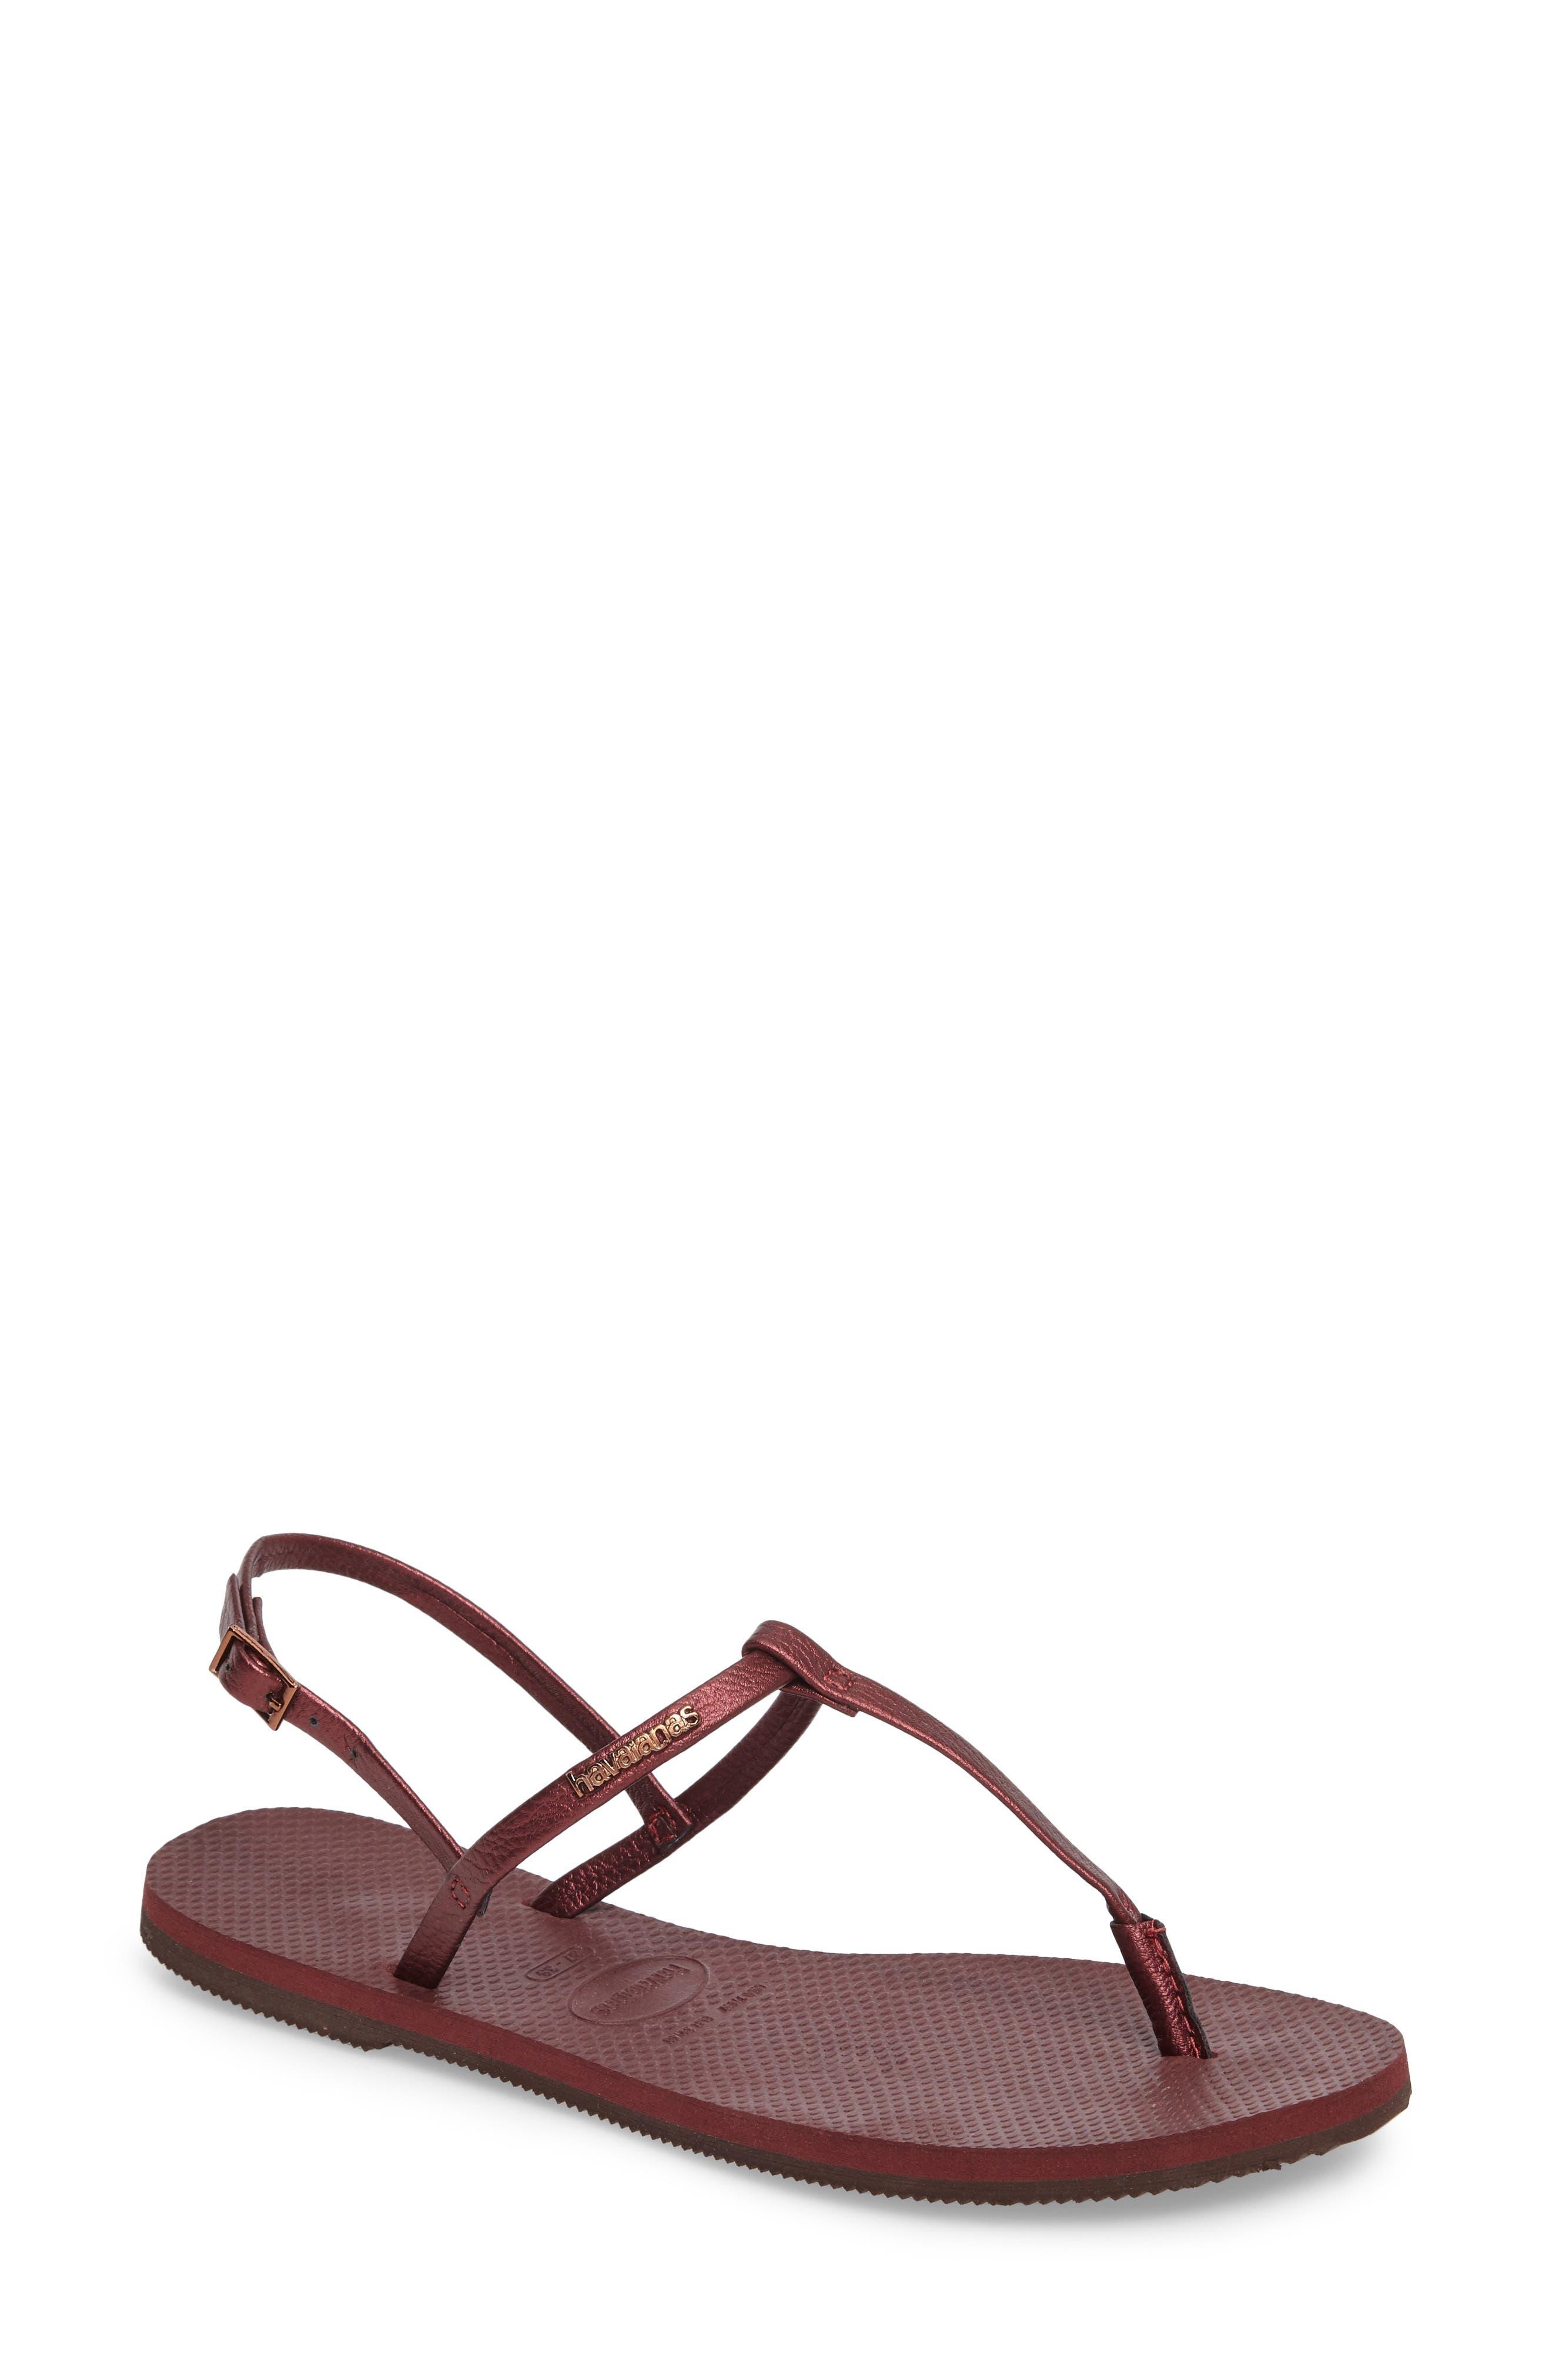 Alternate Image 1 Selected - Havaianas You Riviera Sandal (Women)